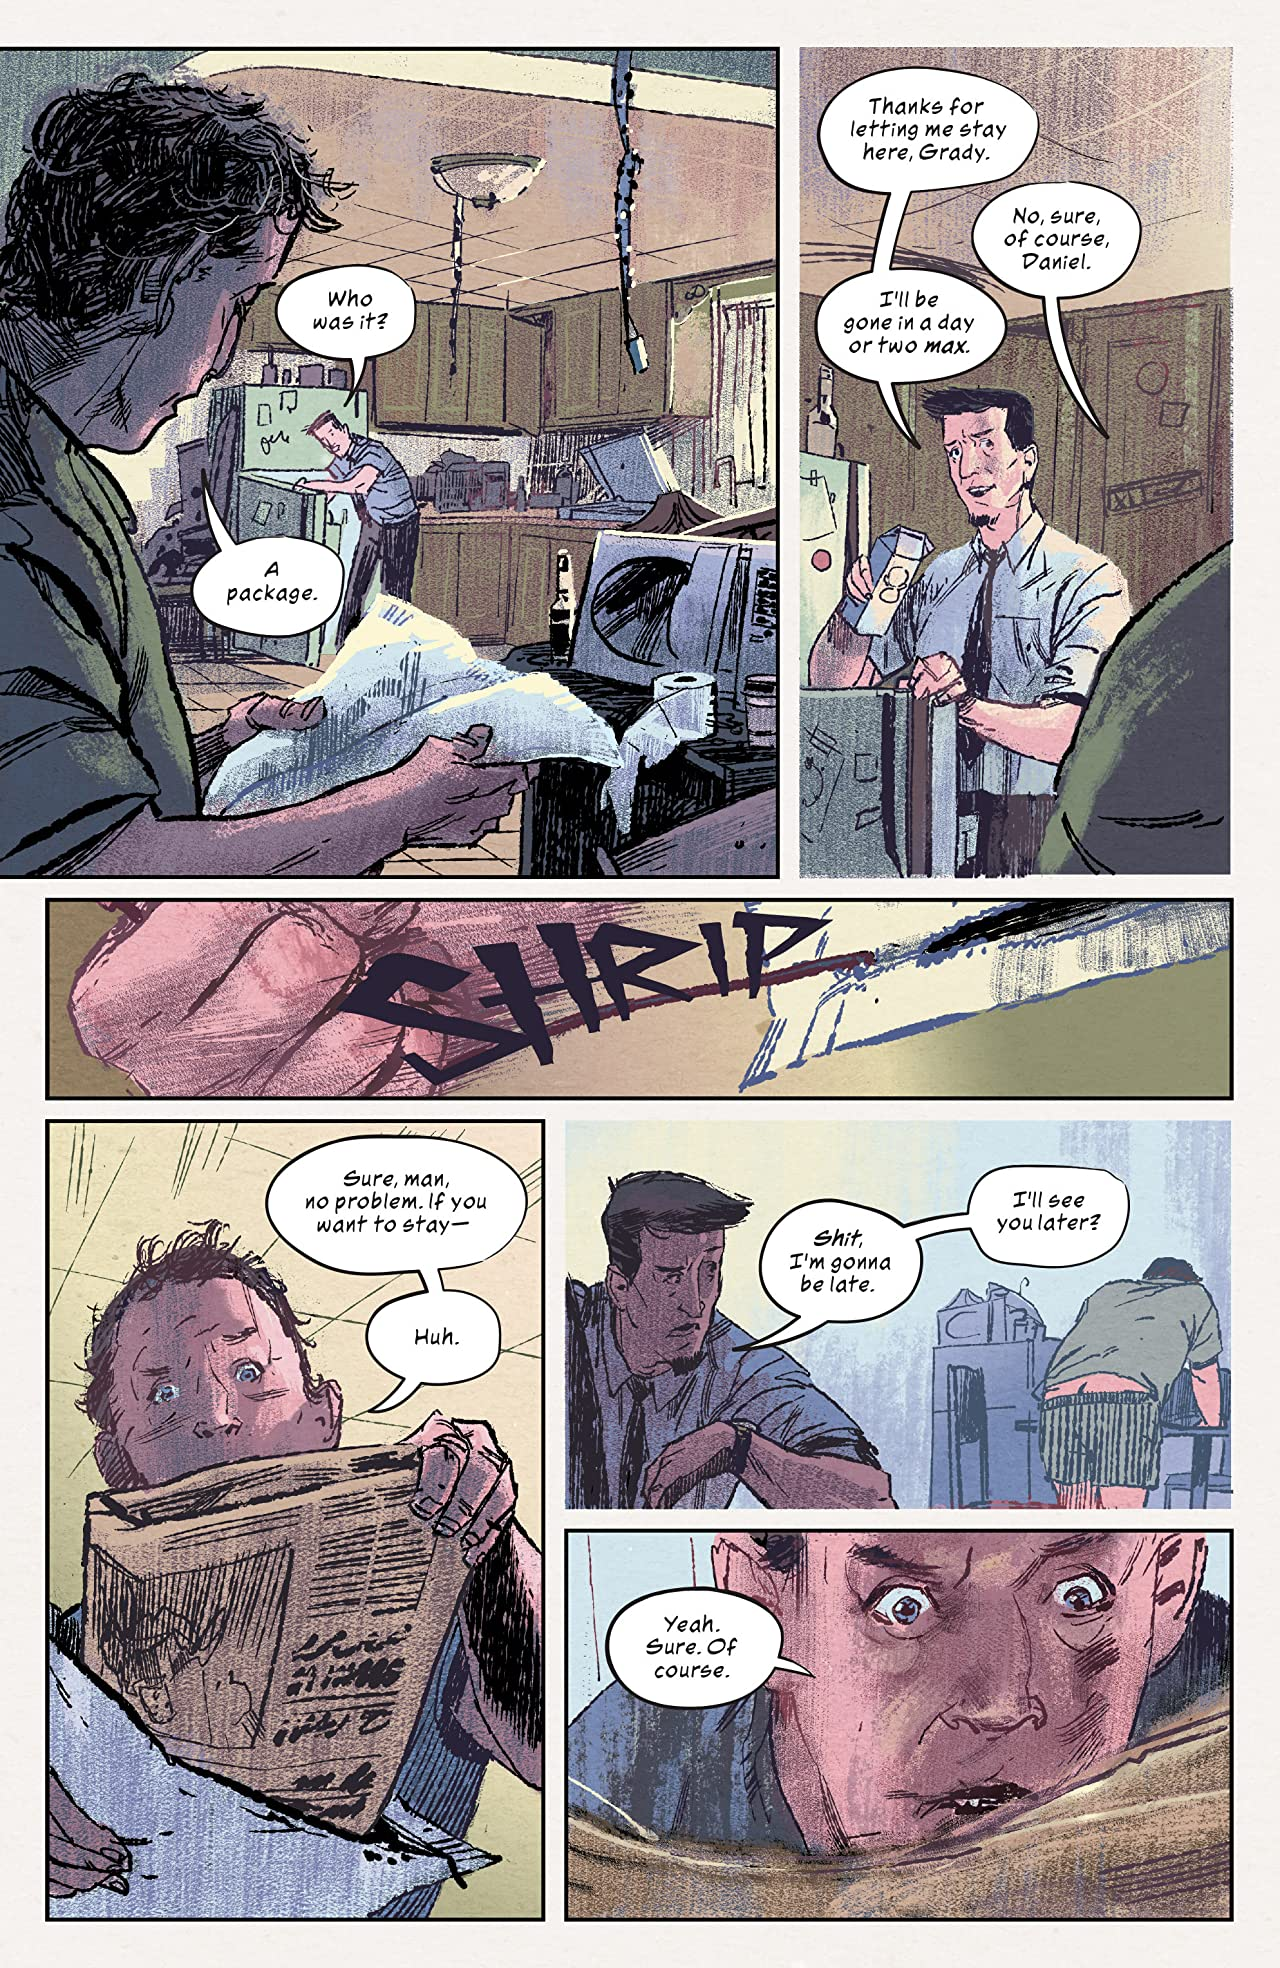 The Bunker #2